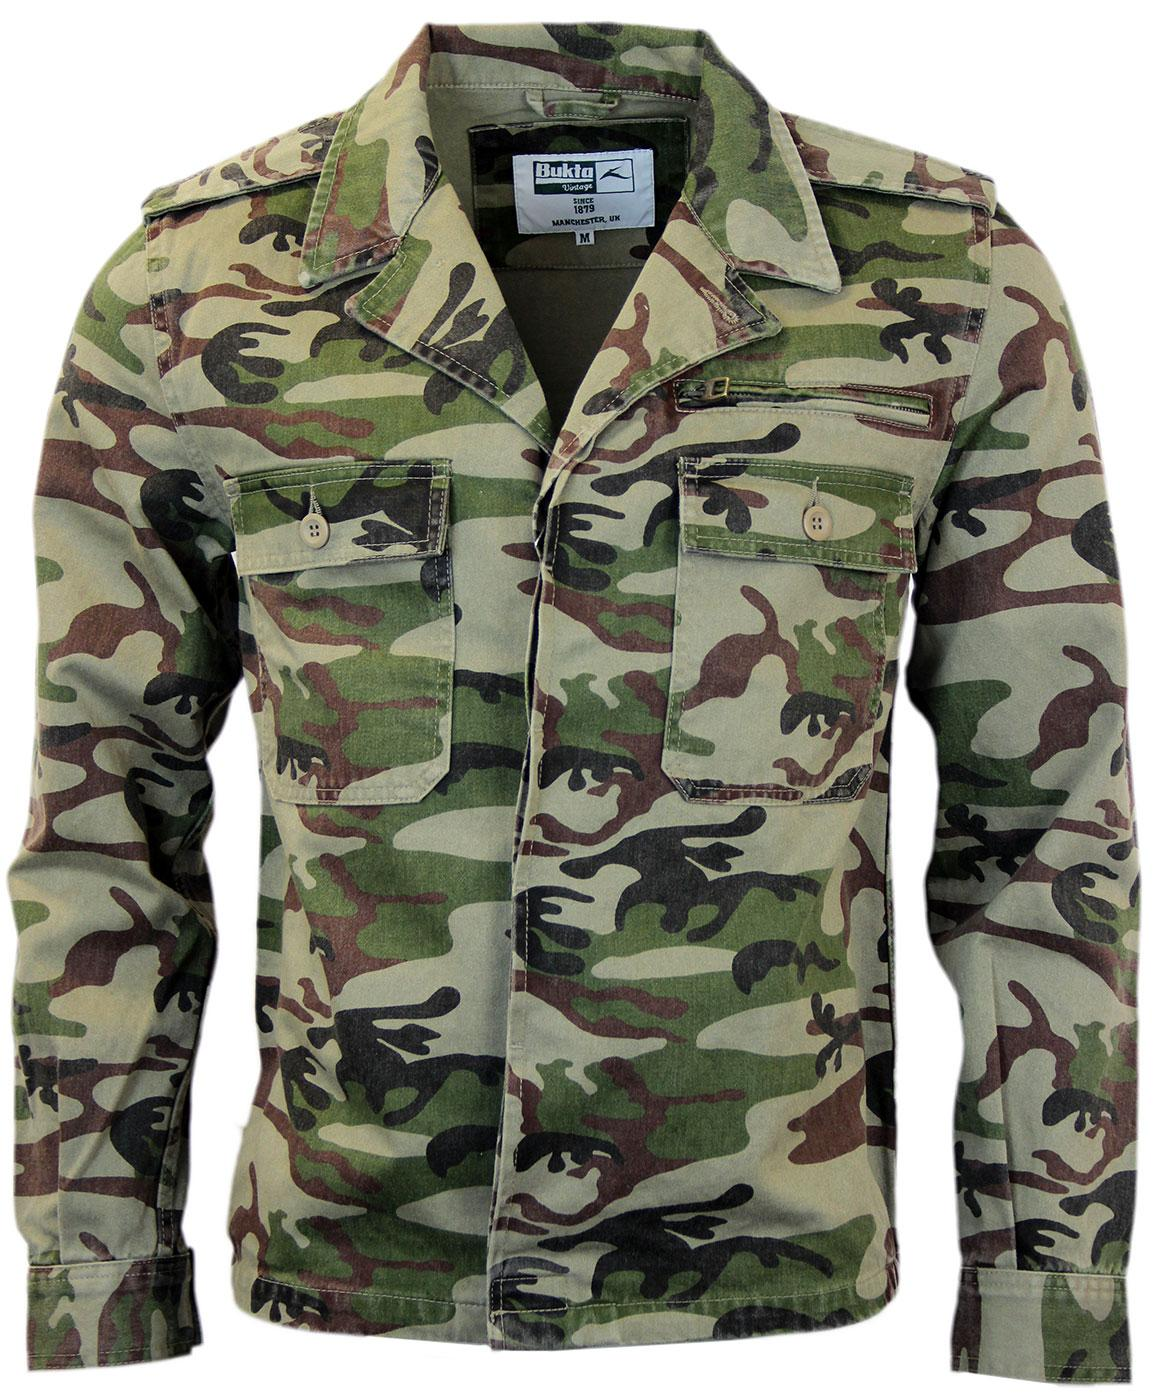 549655faa1e72 One Love Camo Jacket | BUKTA VINTAGE Retro Indie Mod Military Jacket